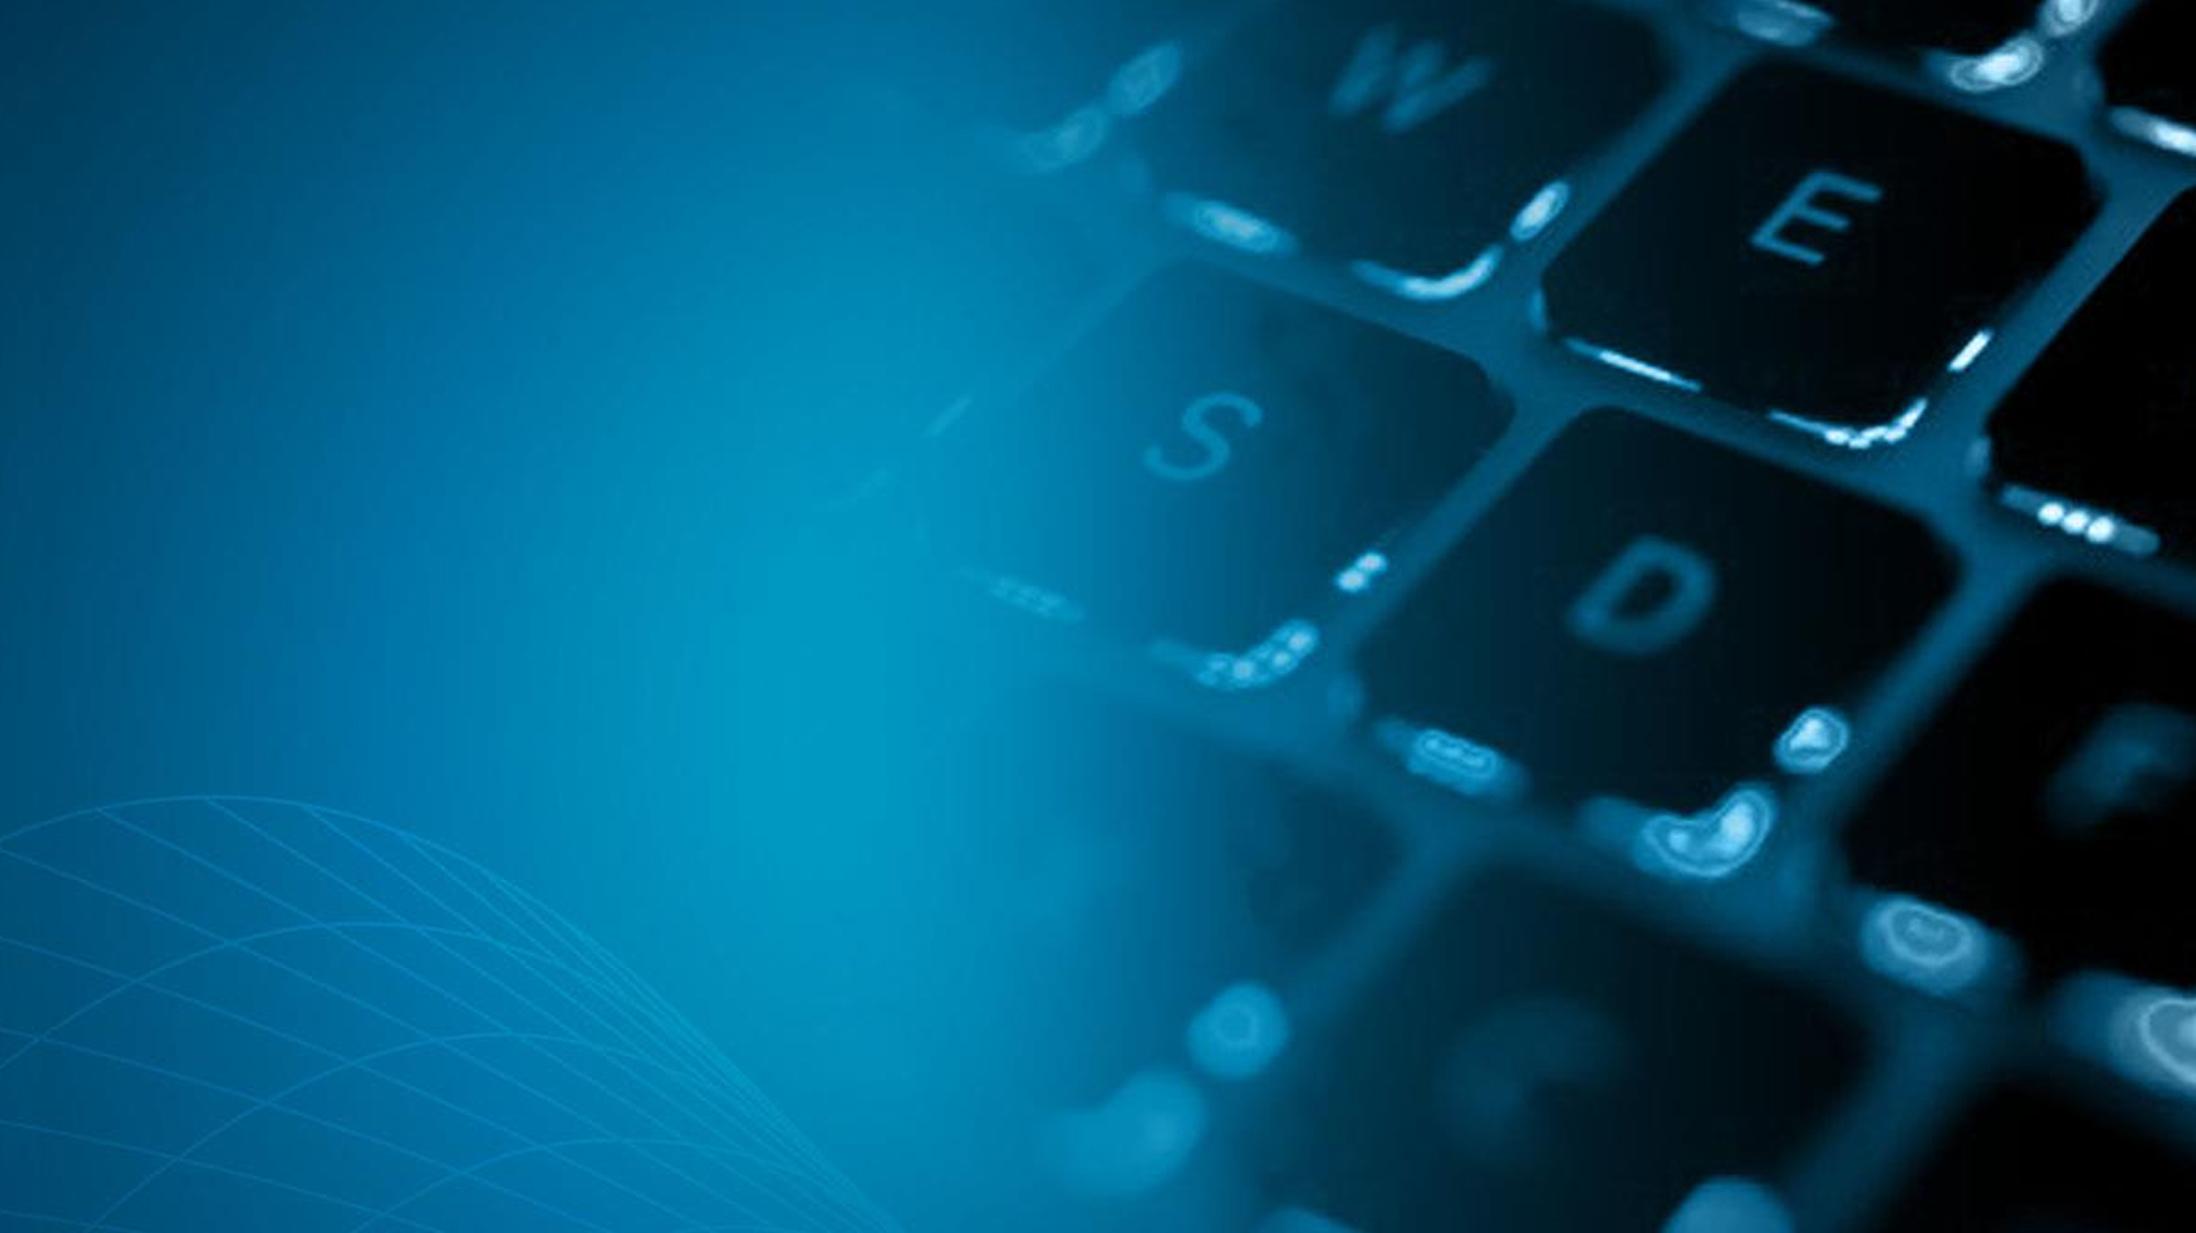 Cyber Stalking FOR WEB_1444690188714.jpg